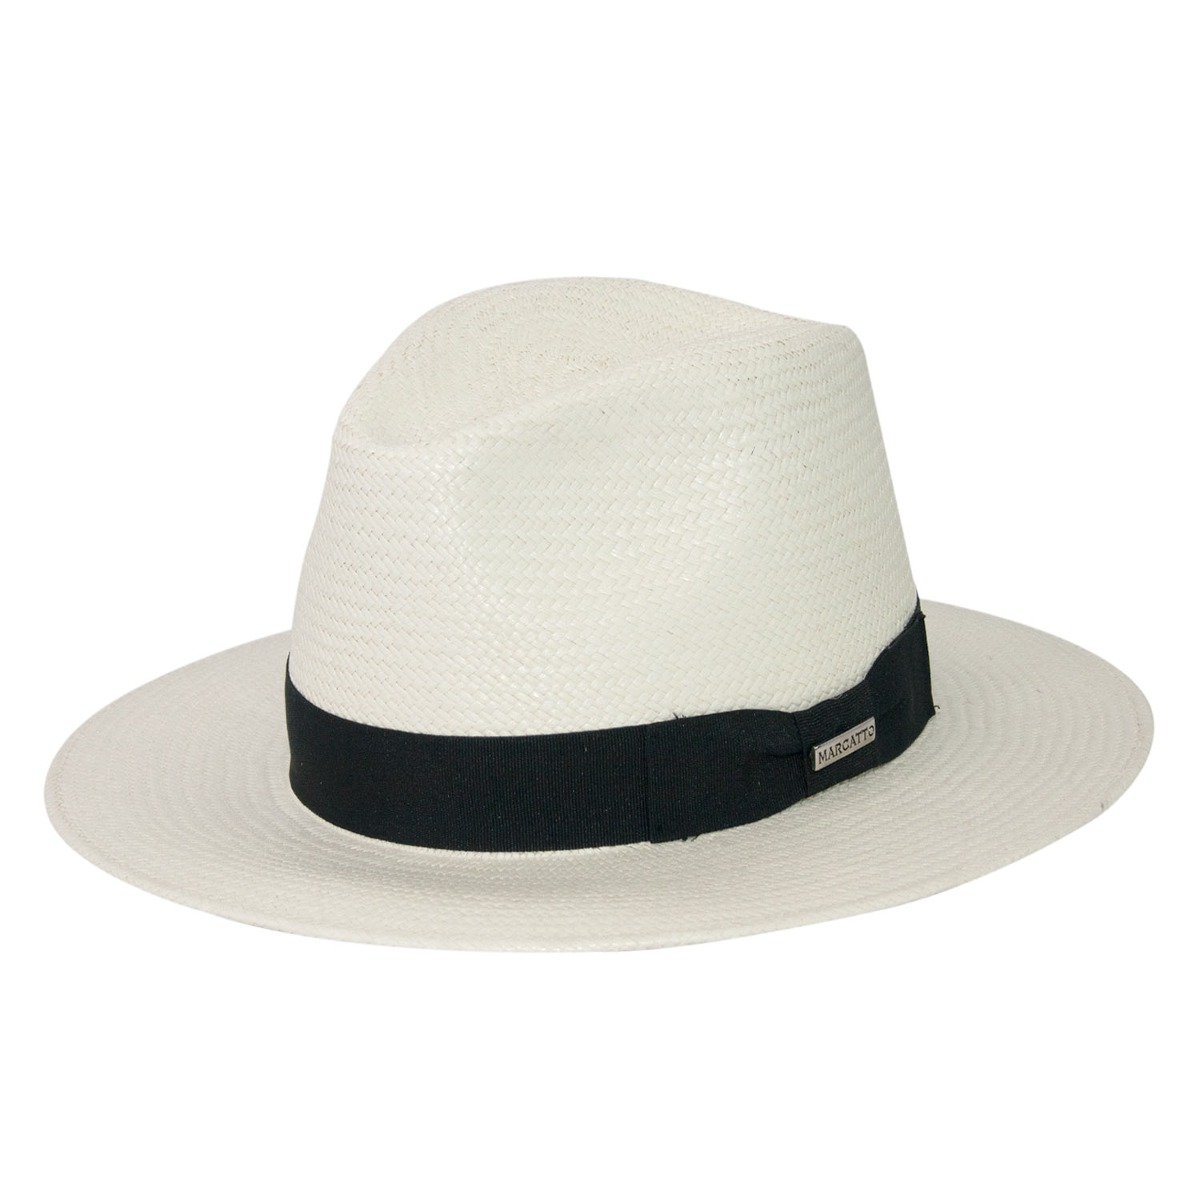 chapéu de palha panamá marcatto casual fita preta. Carregando zoom. c467ec3e80b